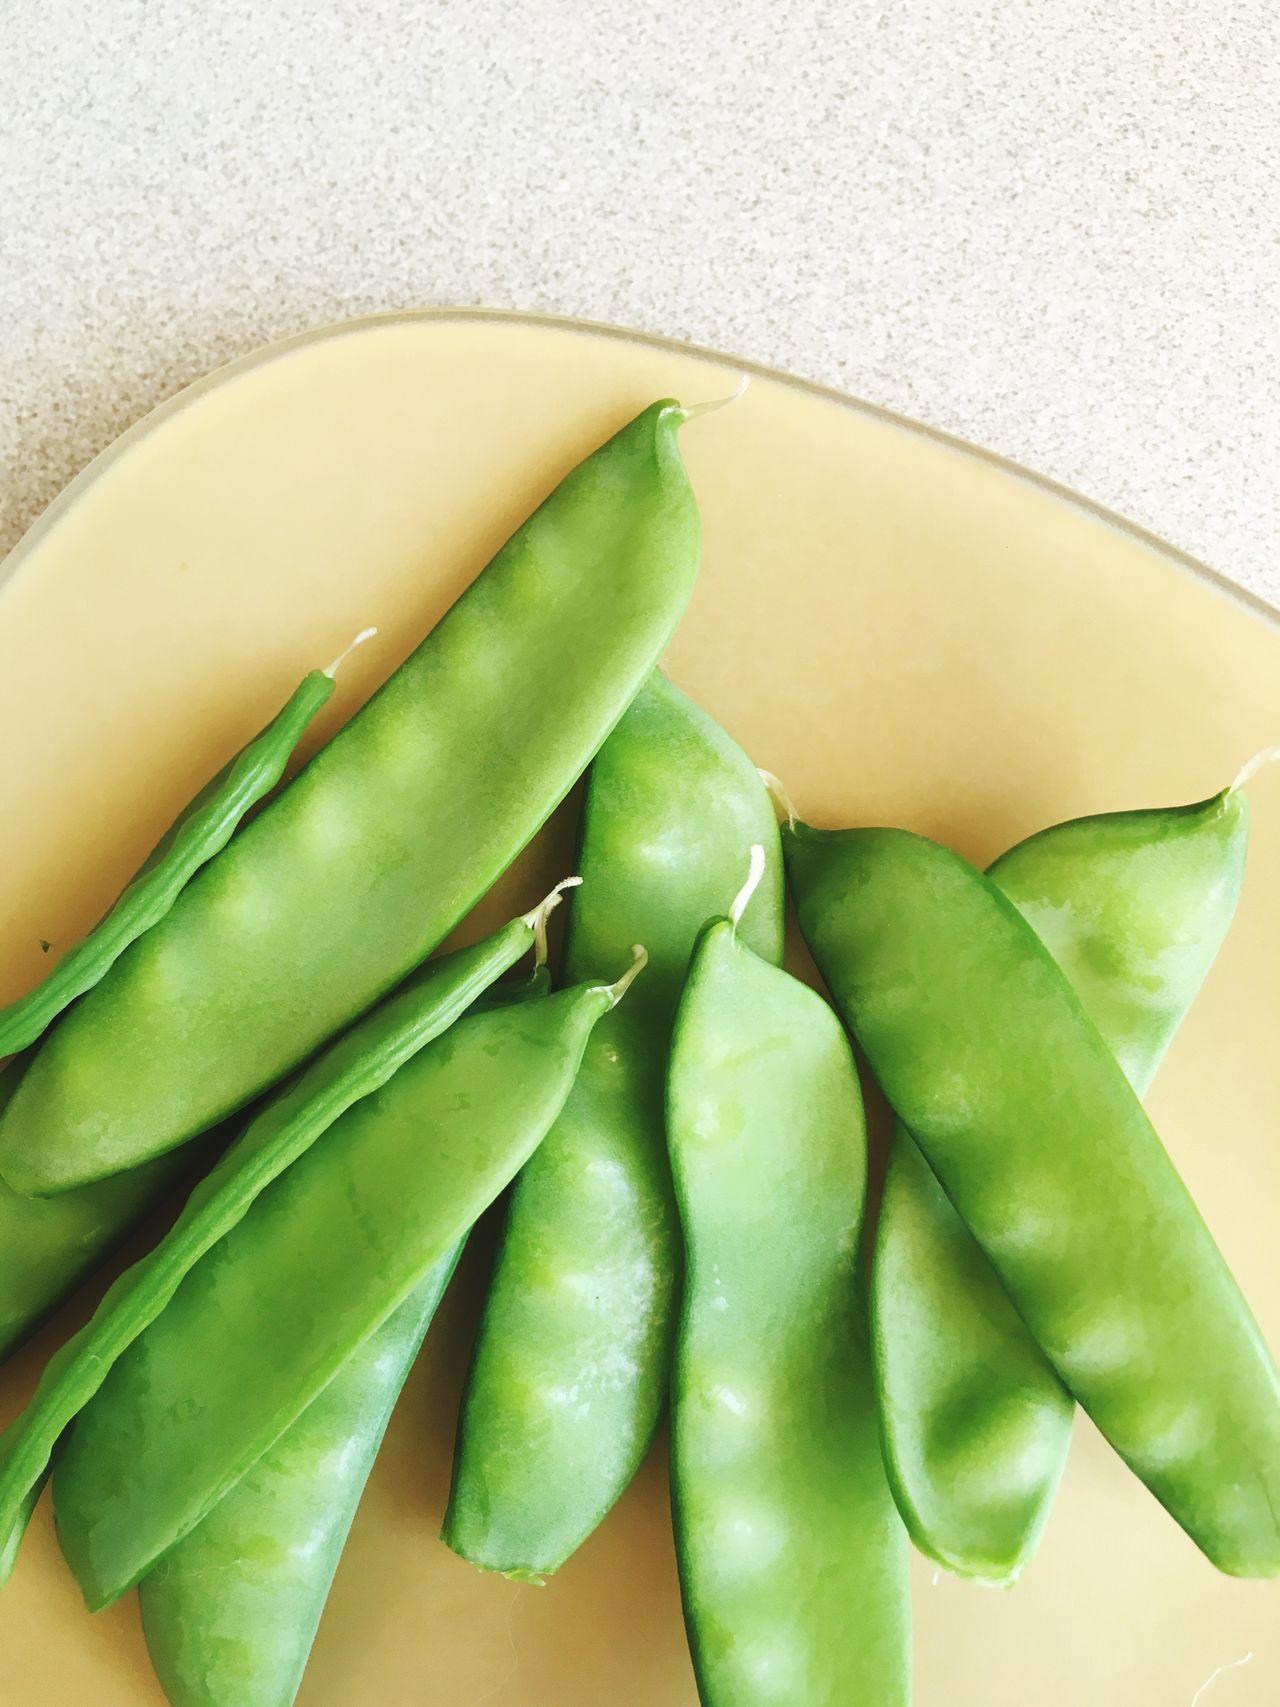 Food Green Color Healthy Eating Vegetable Indoors